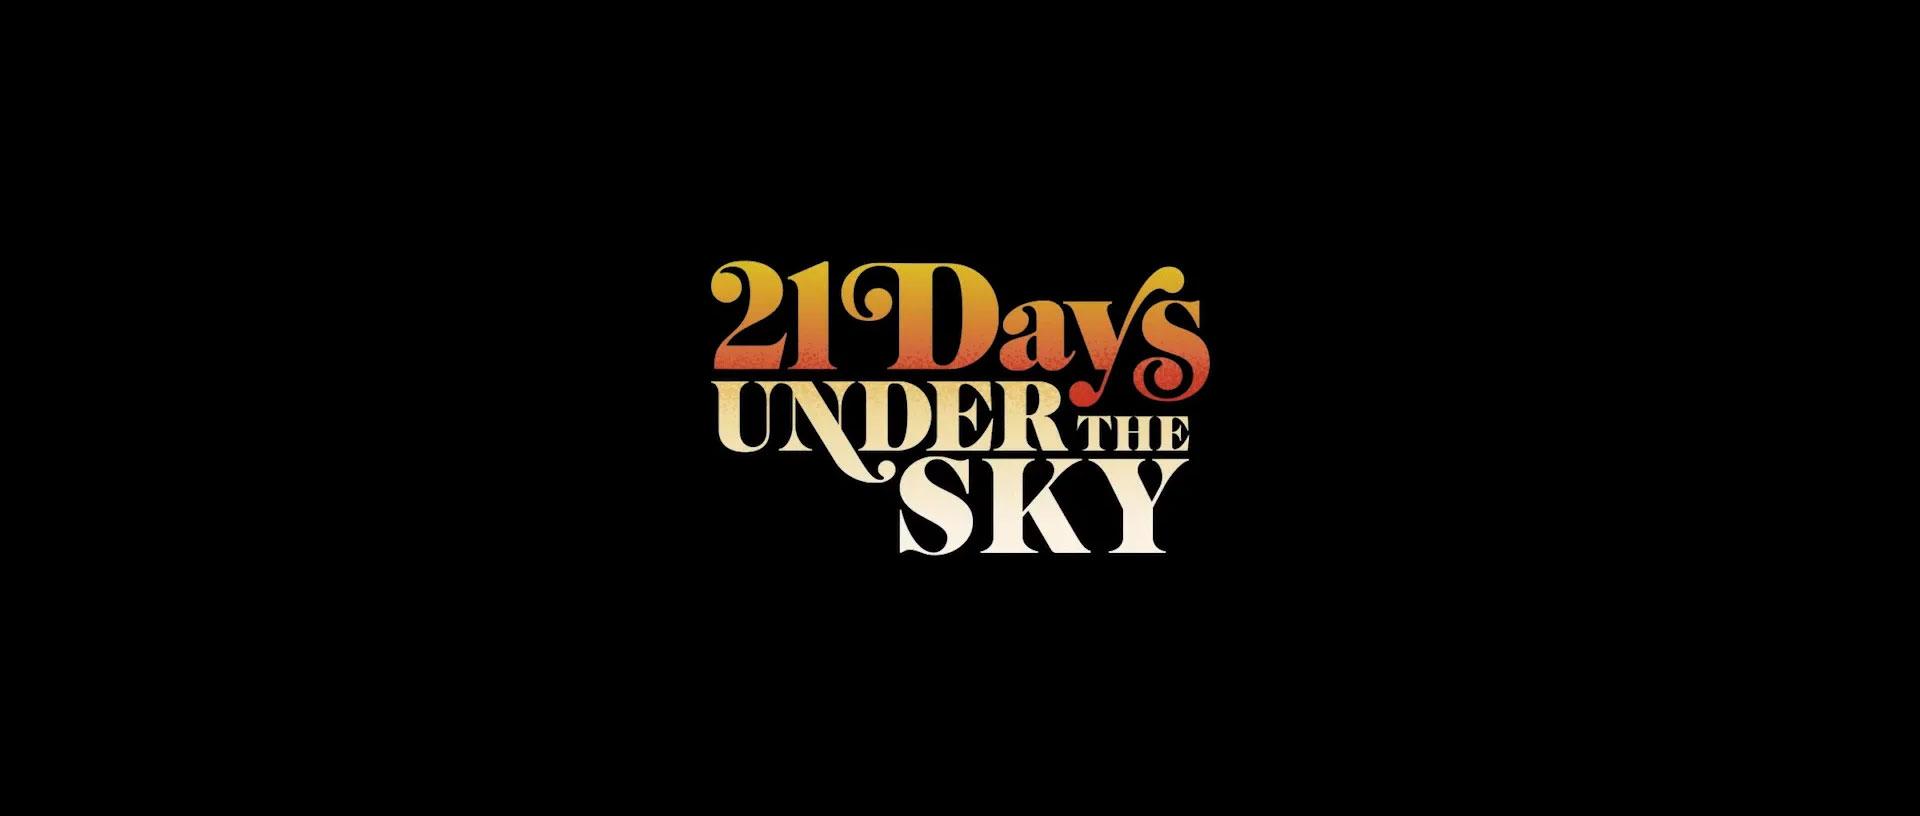 21 Days Under the Sky title design